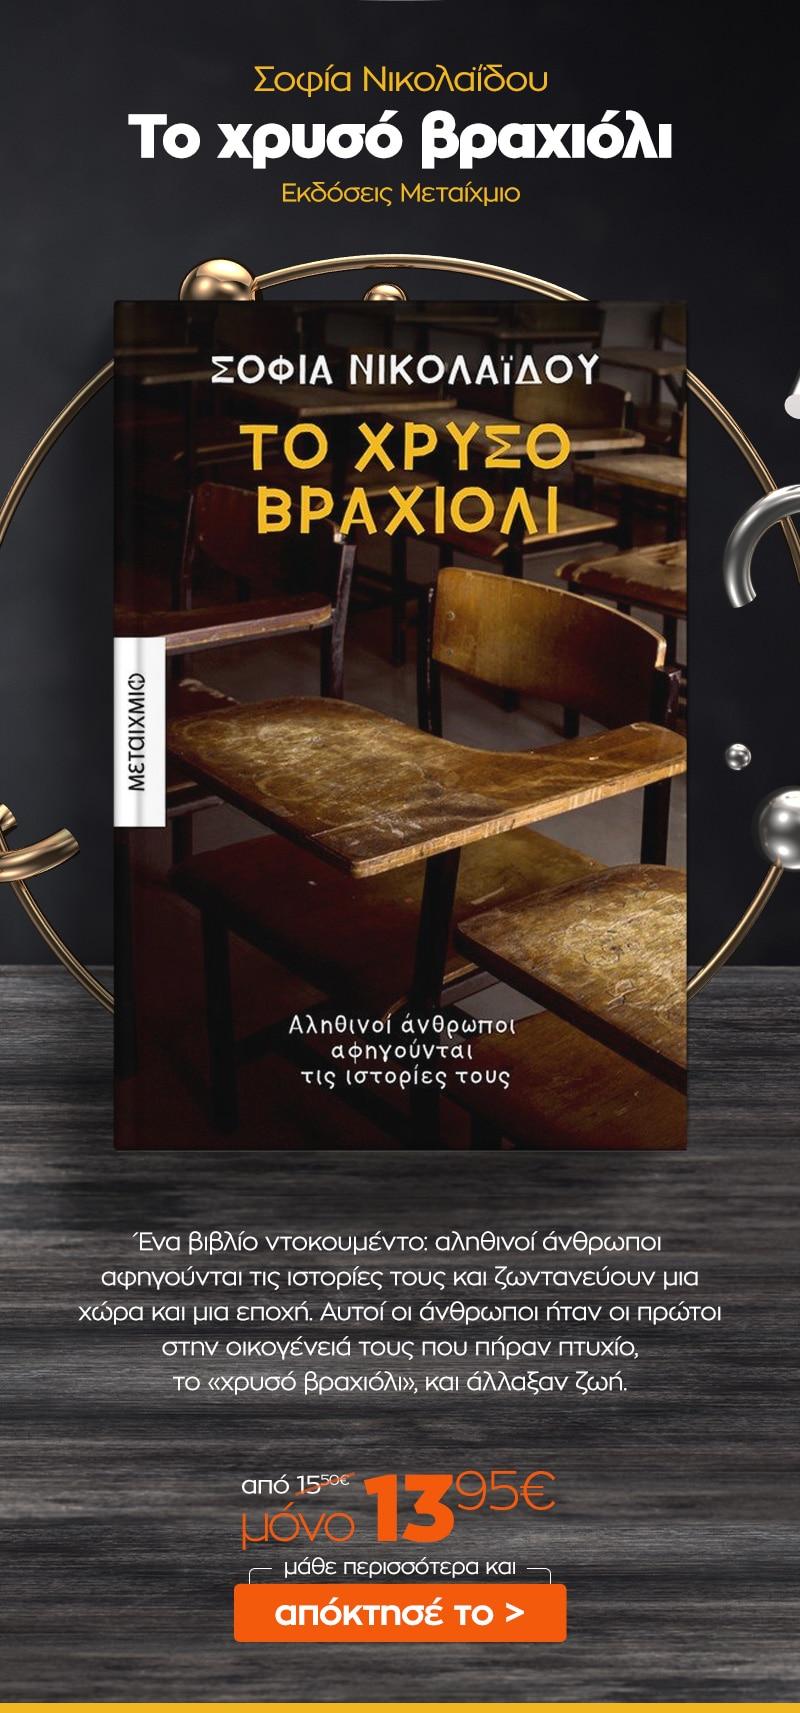 01_to_xriso_vraxioli